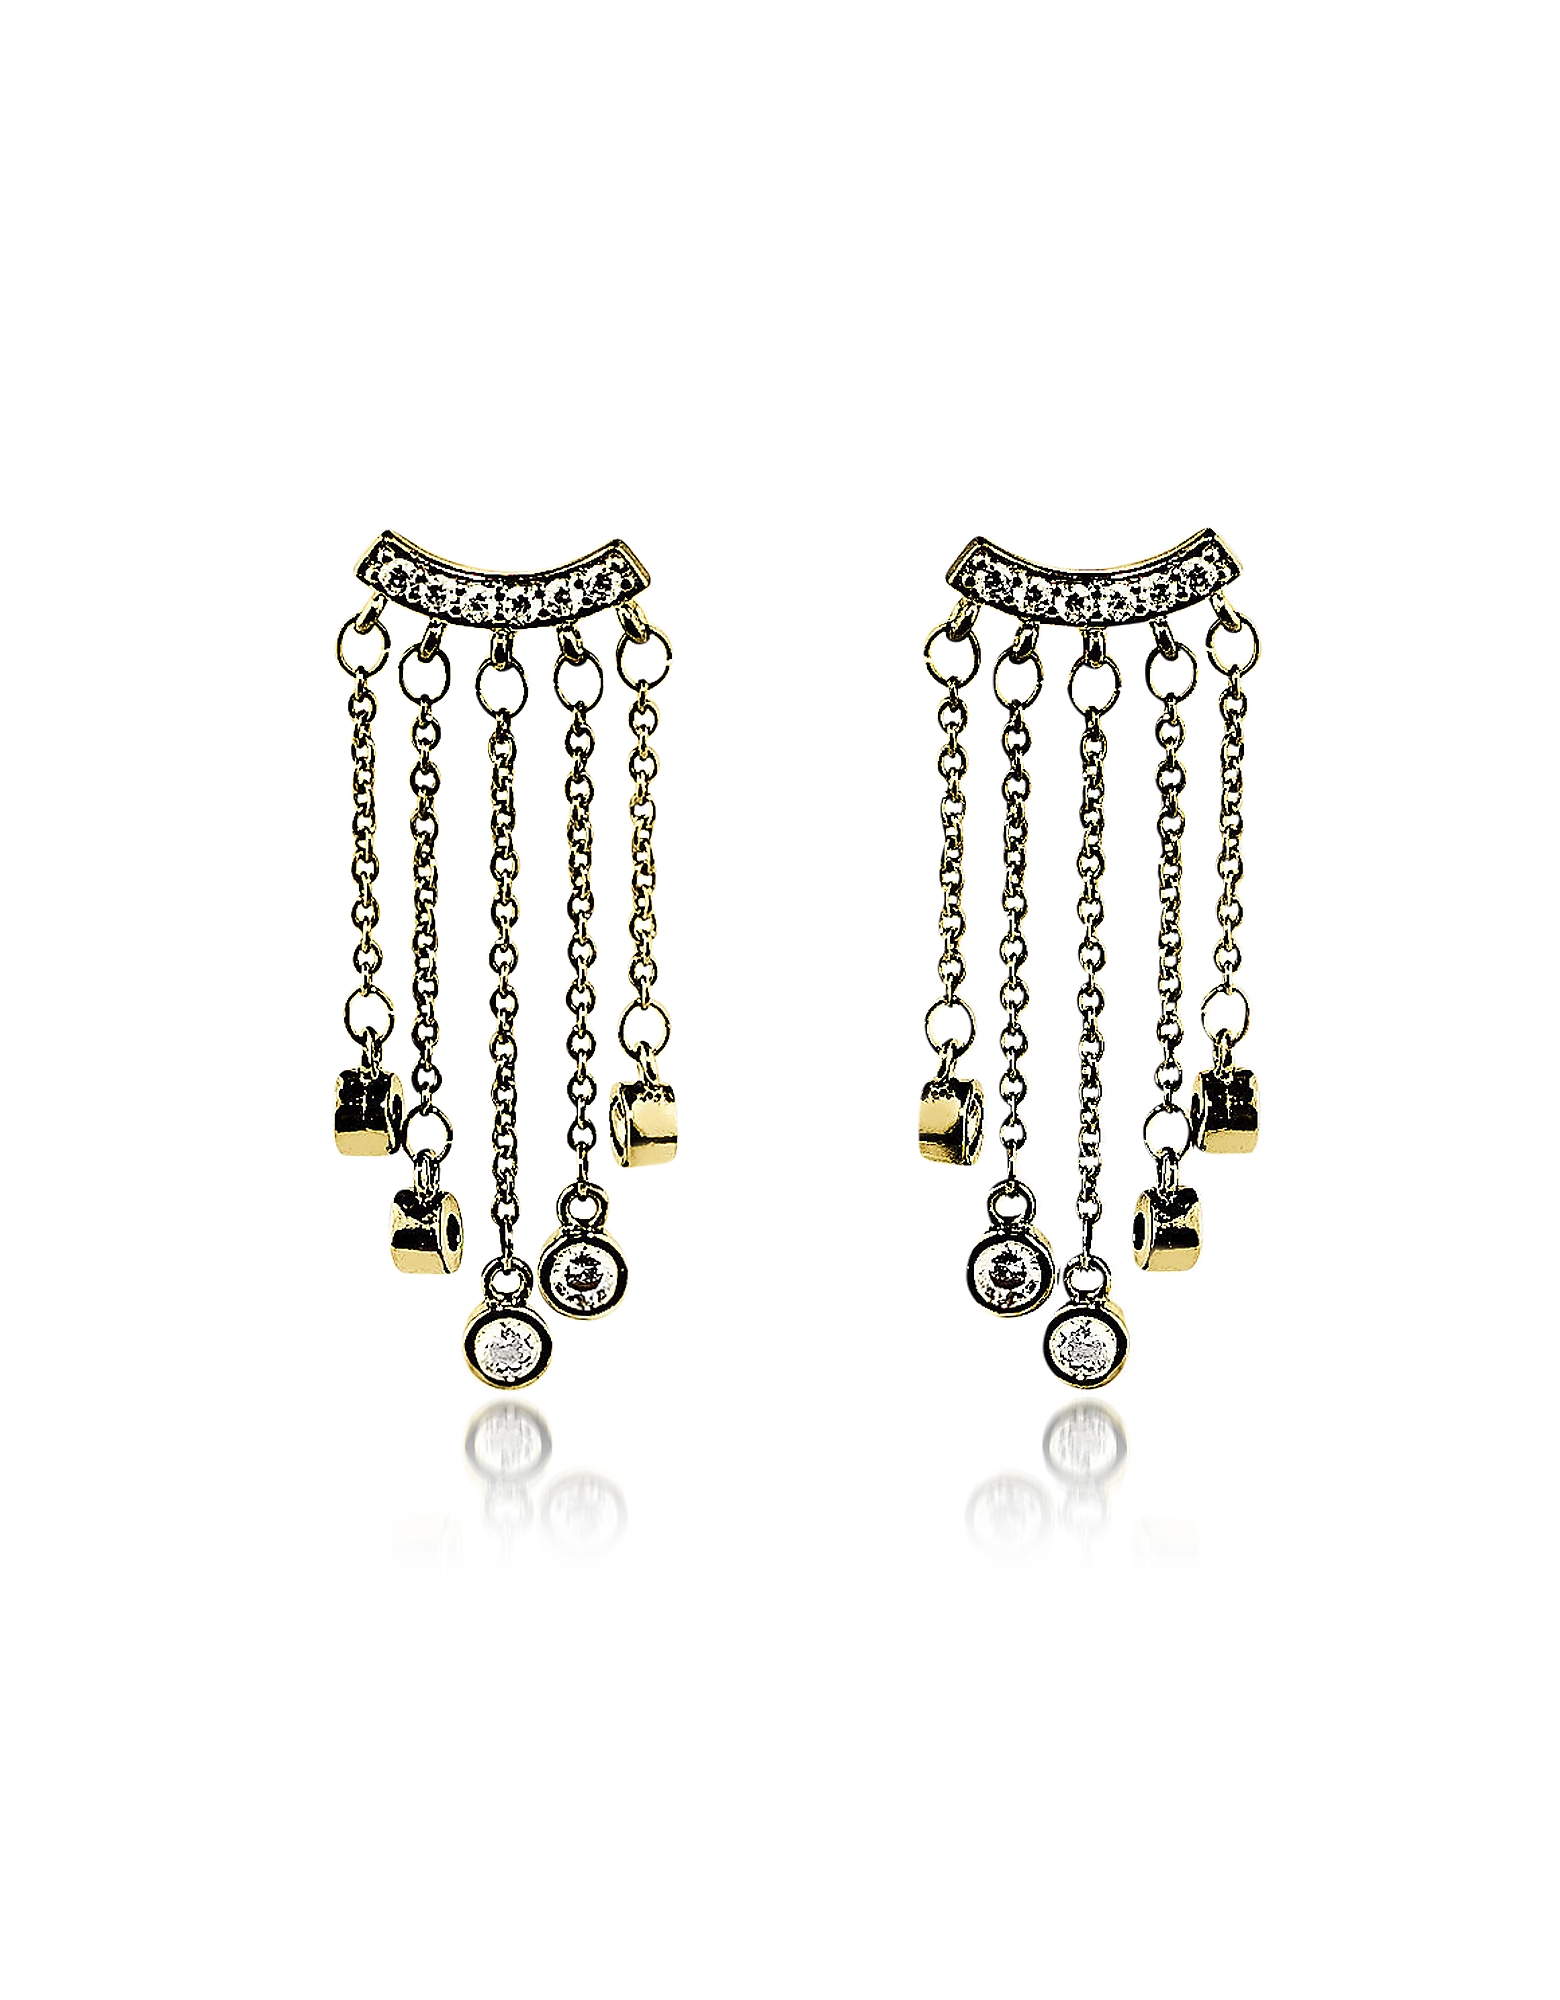 Federica Tosi Earrings, Small Rain Earrings